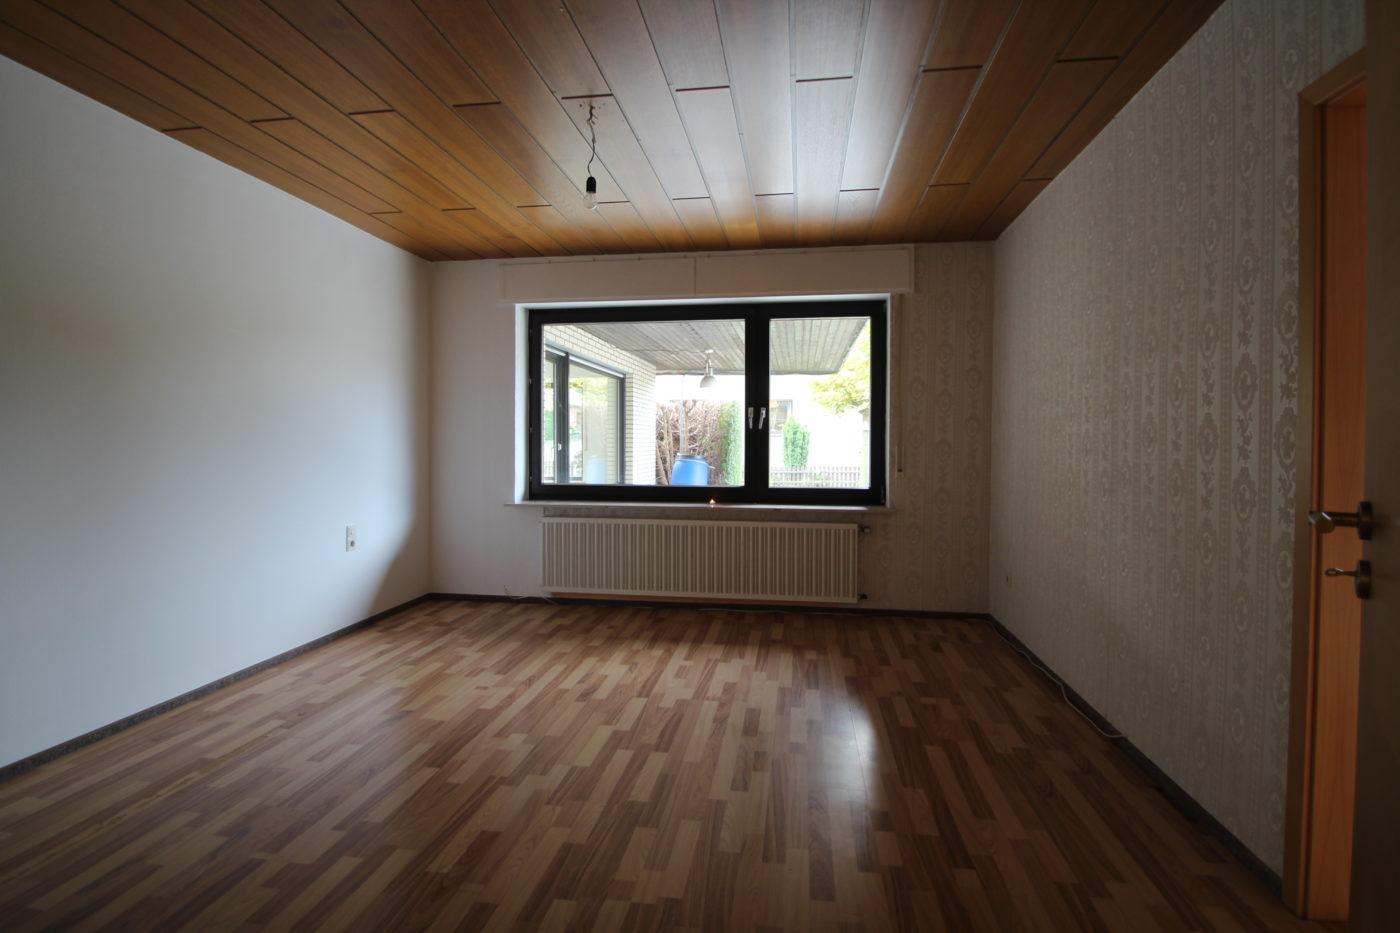 Vorher Foto vom Schlafzimmer. Schlafzimmer vor dem Homestaging durch Blickfang Homestaging in Soest